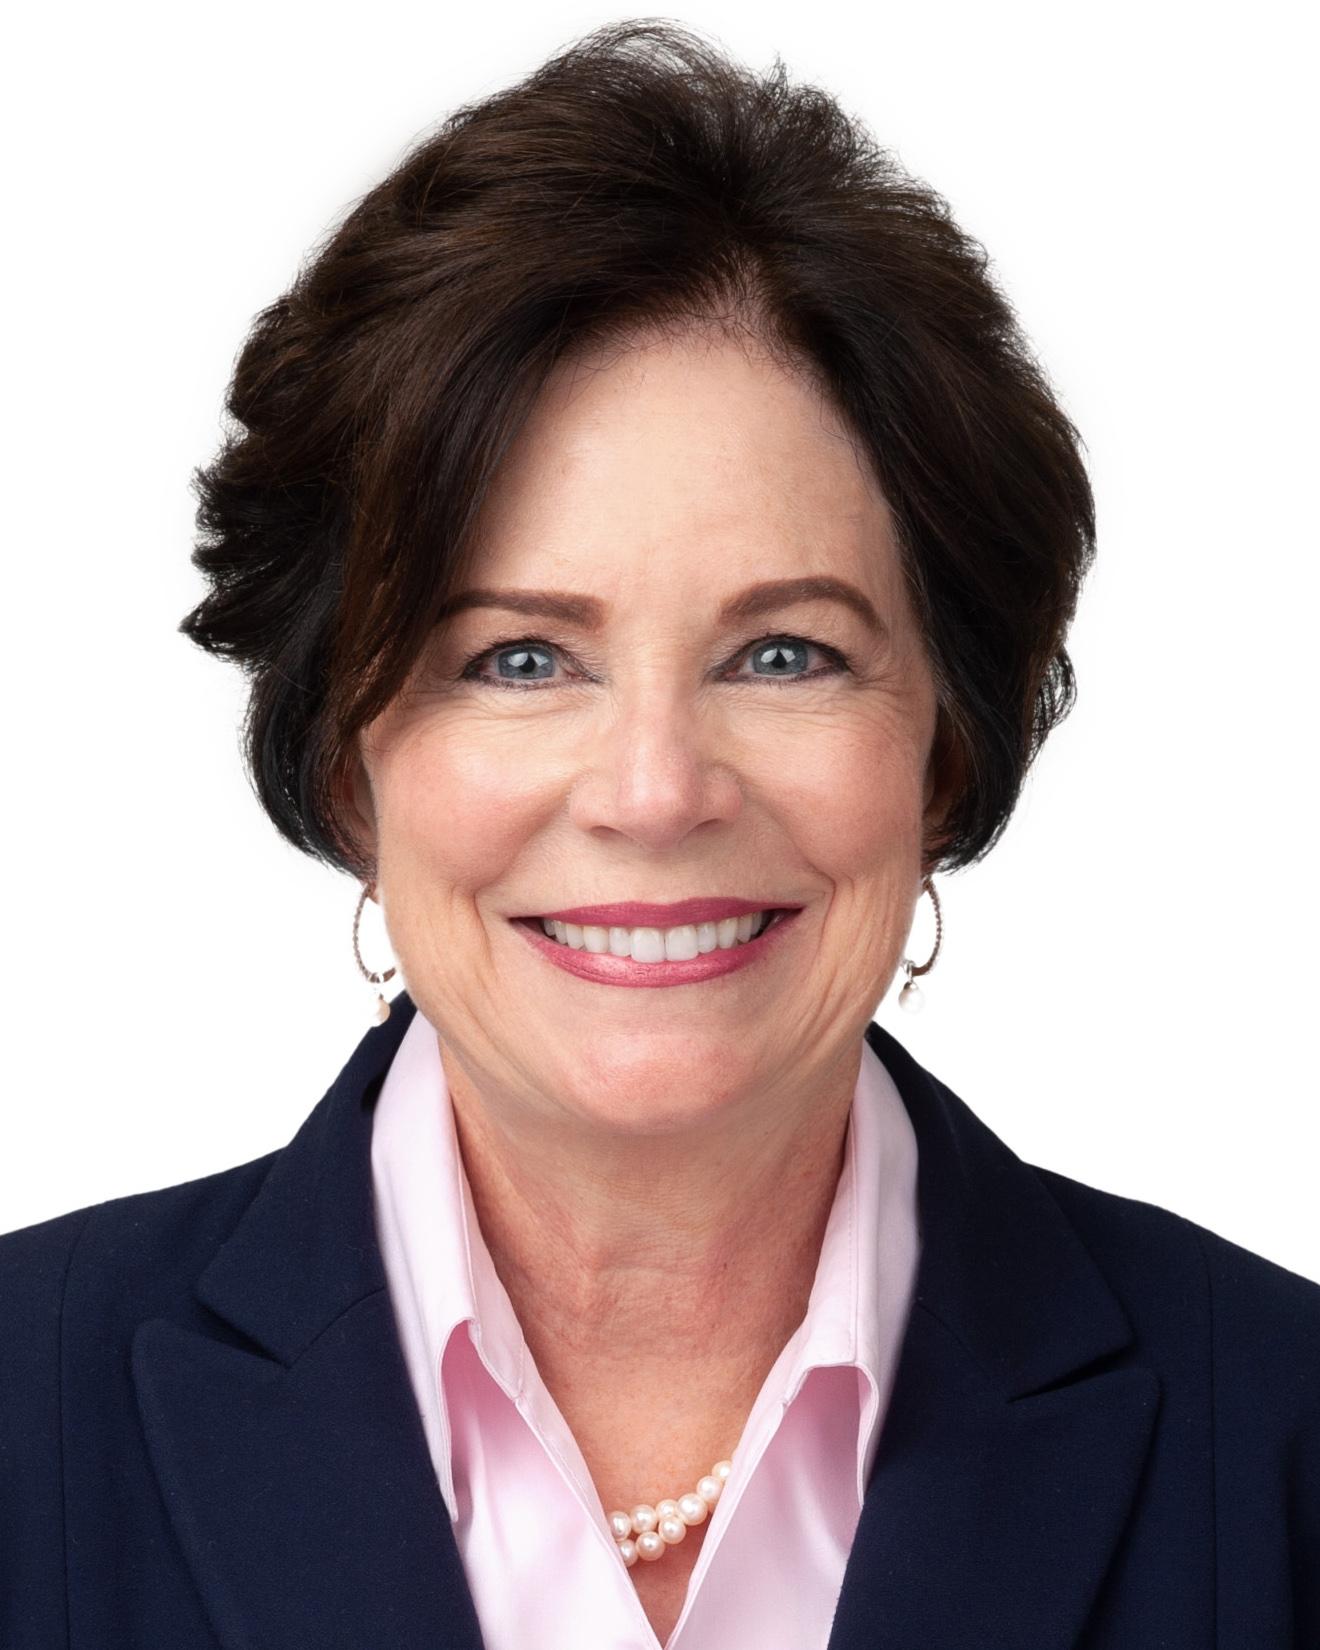 Michelle Jernigan